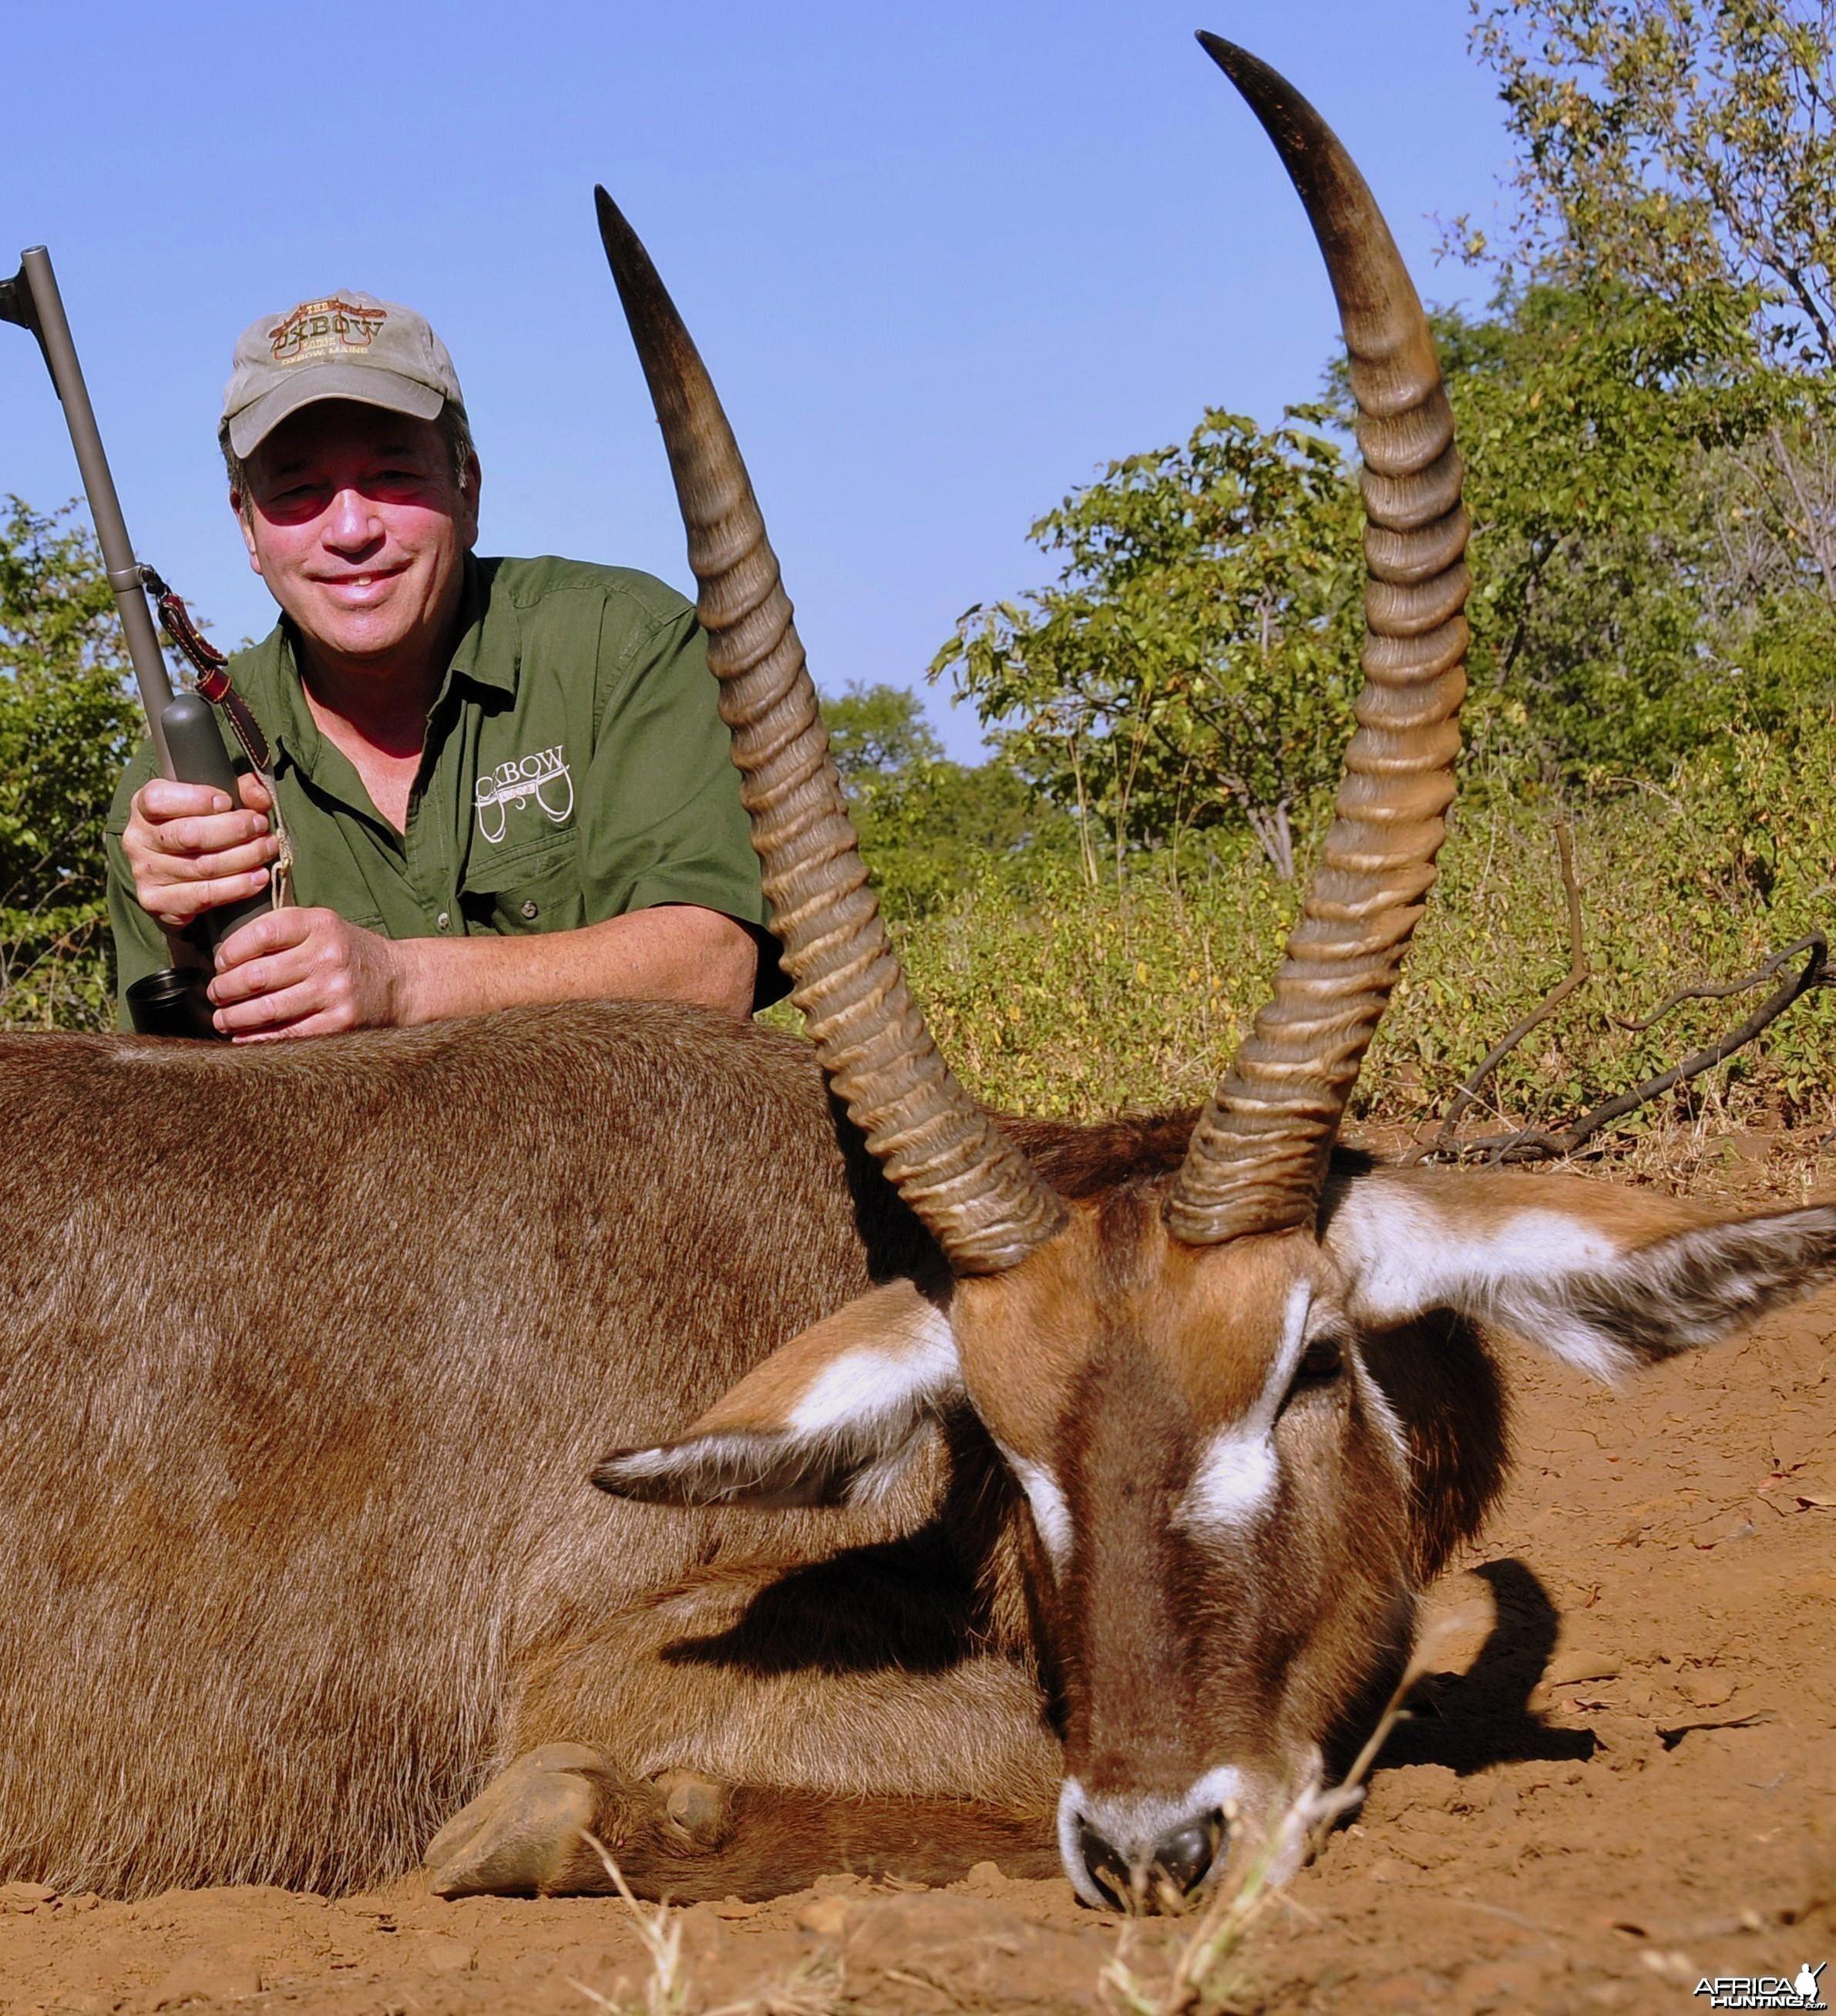 Waterbuck Bull taken in Zimbabwe